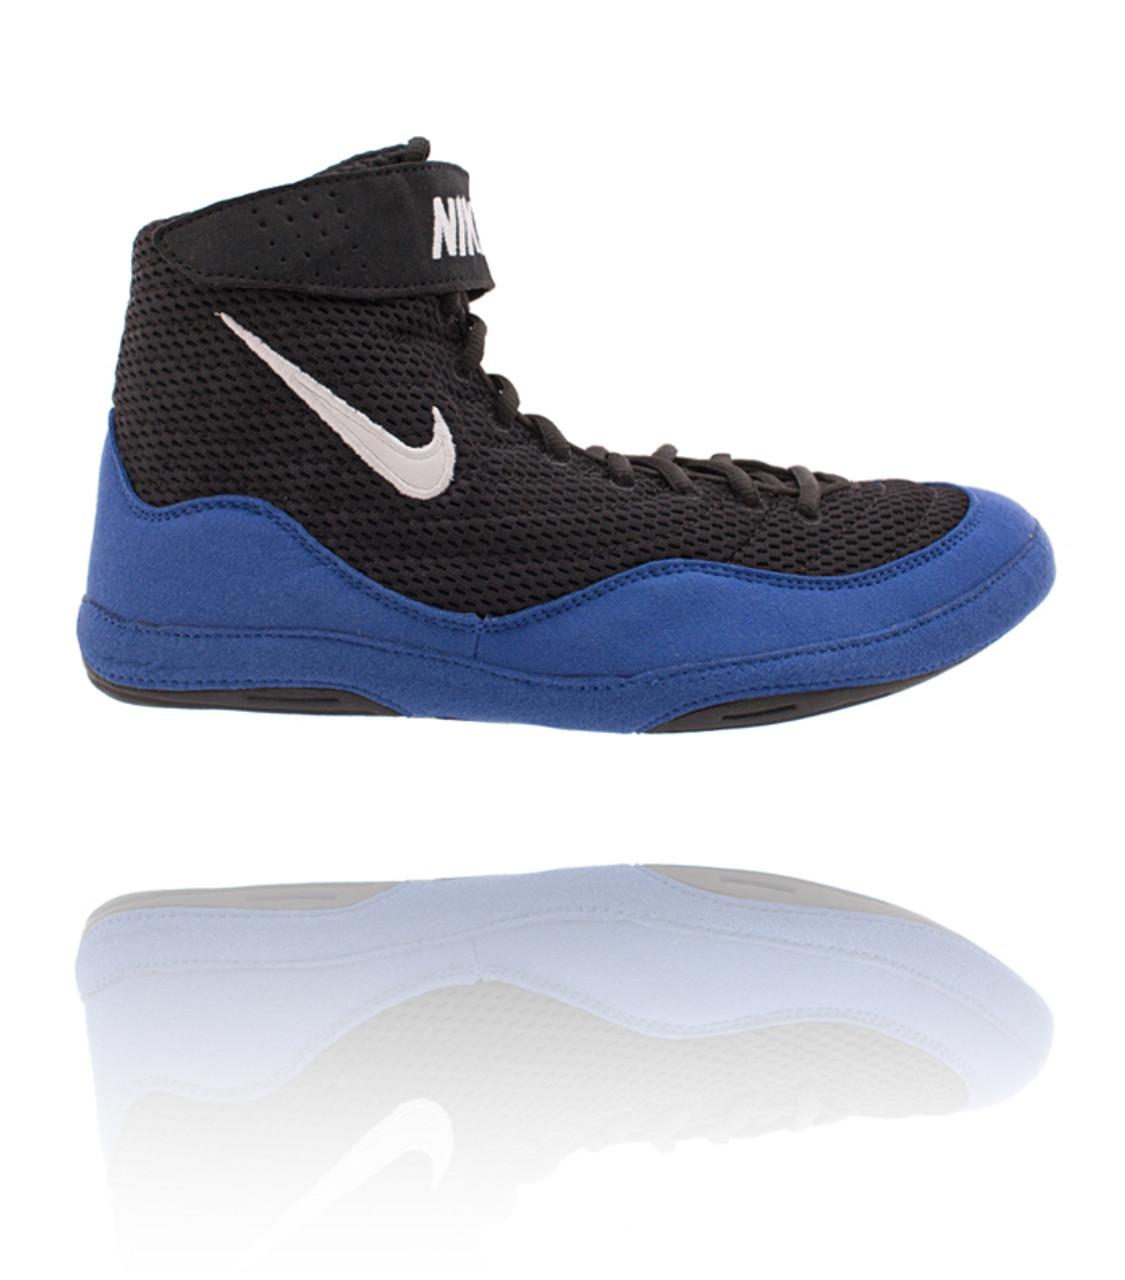 Nike Inflict 3 - Royal Blue / Black